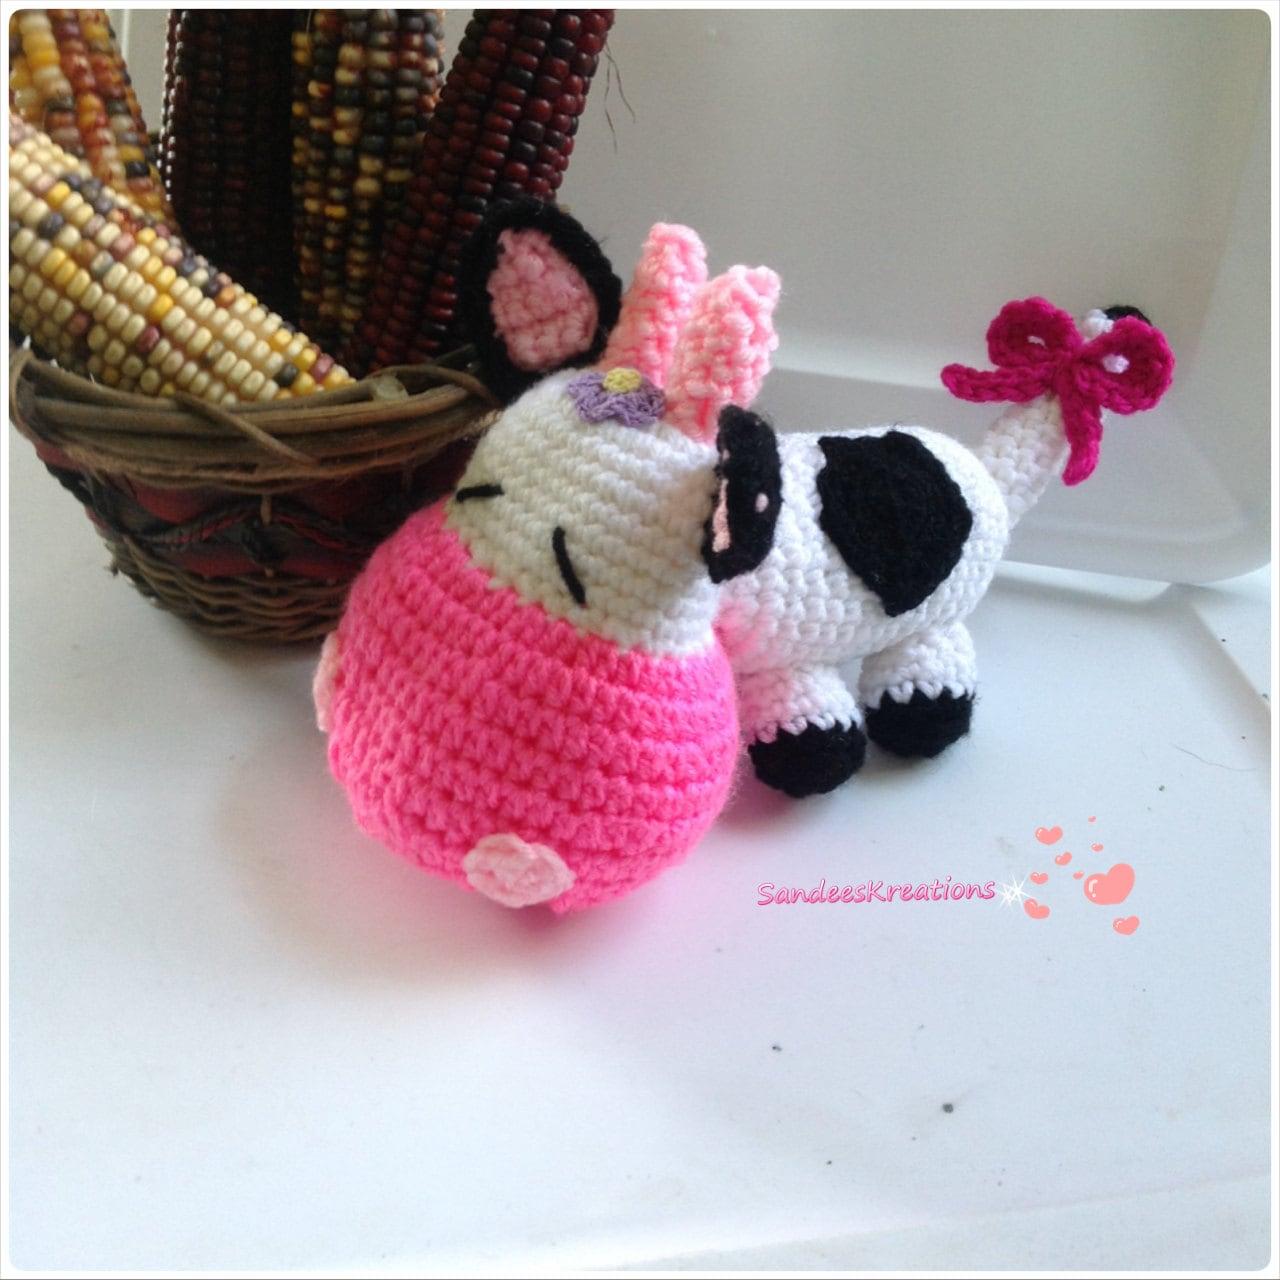 Amigurumi Horns : Crochet Cow Amigurumi Cow with Horns Bedroom Decor Plush